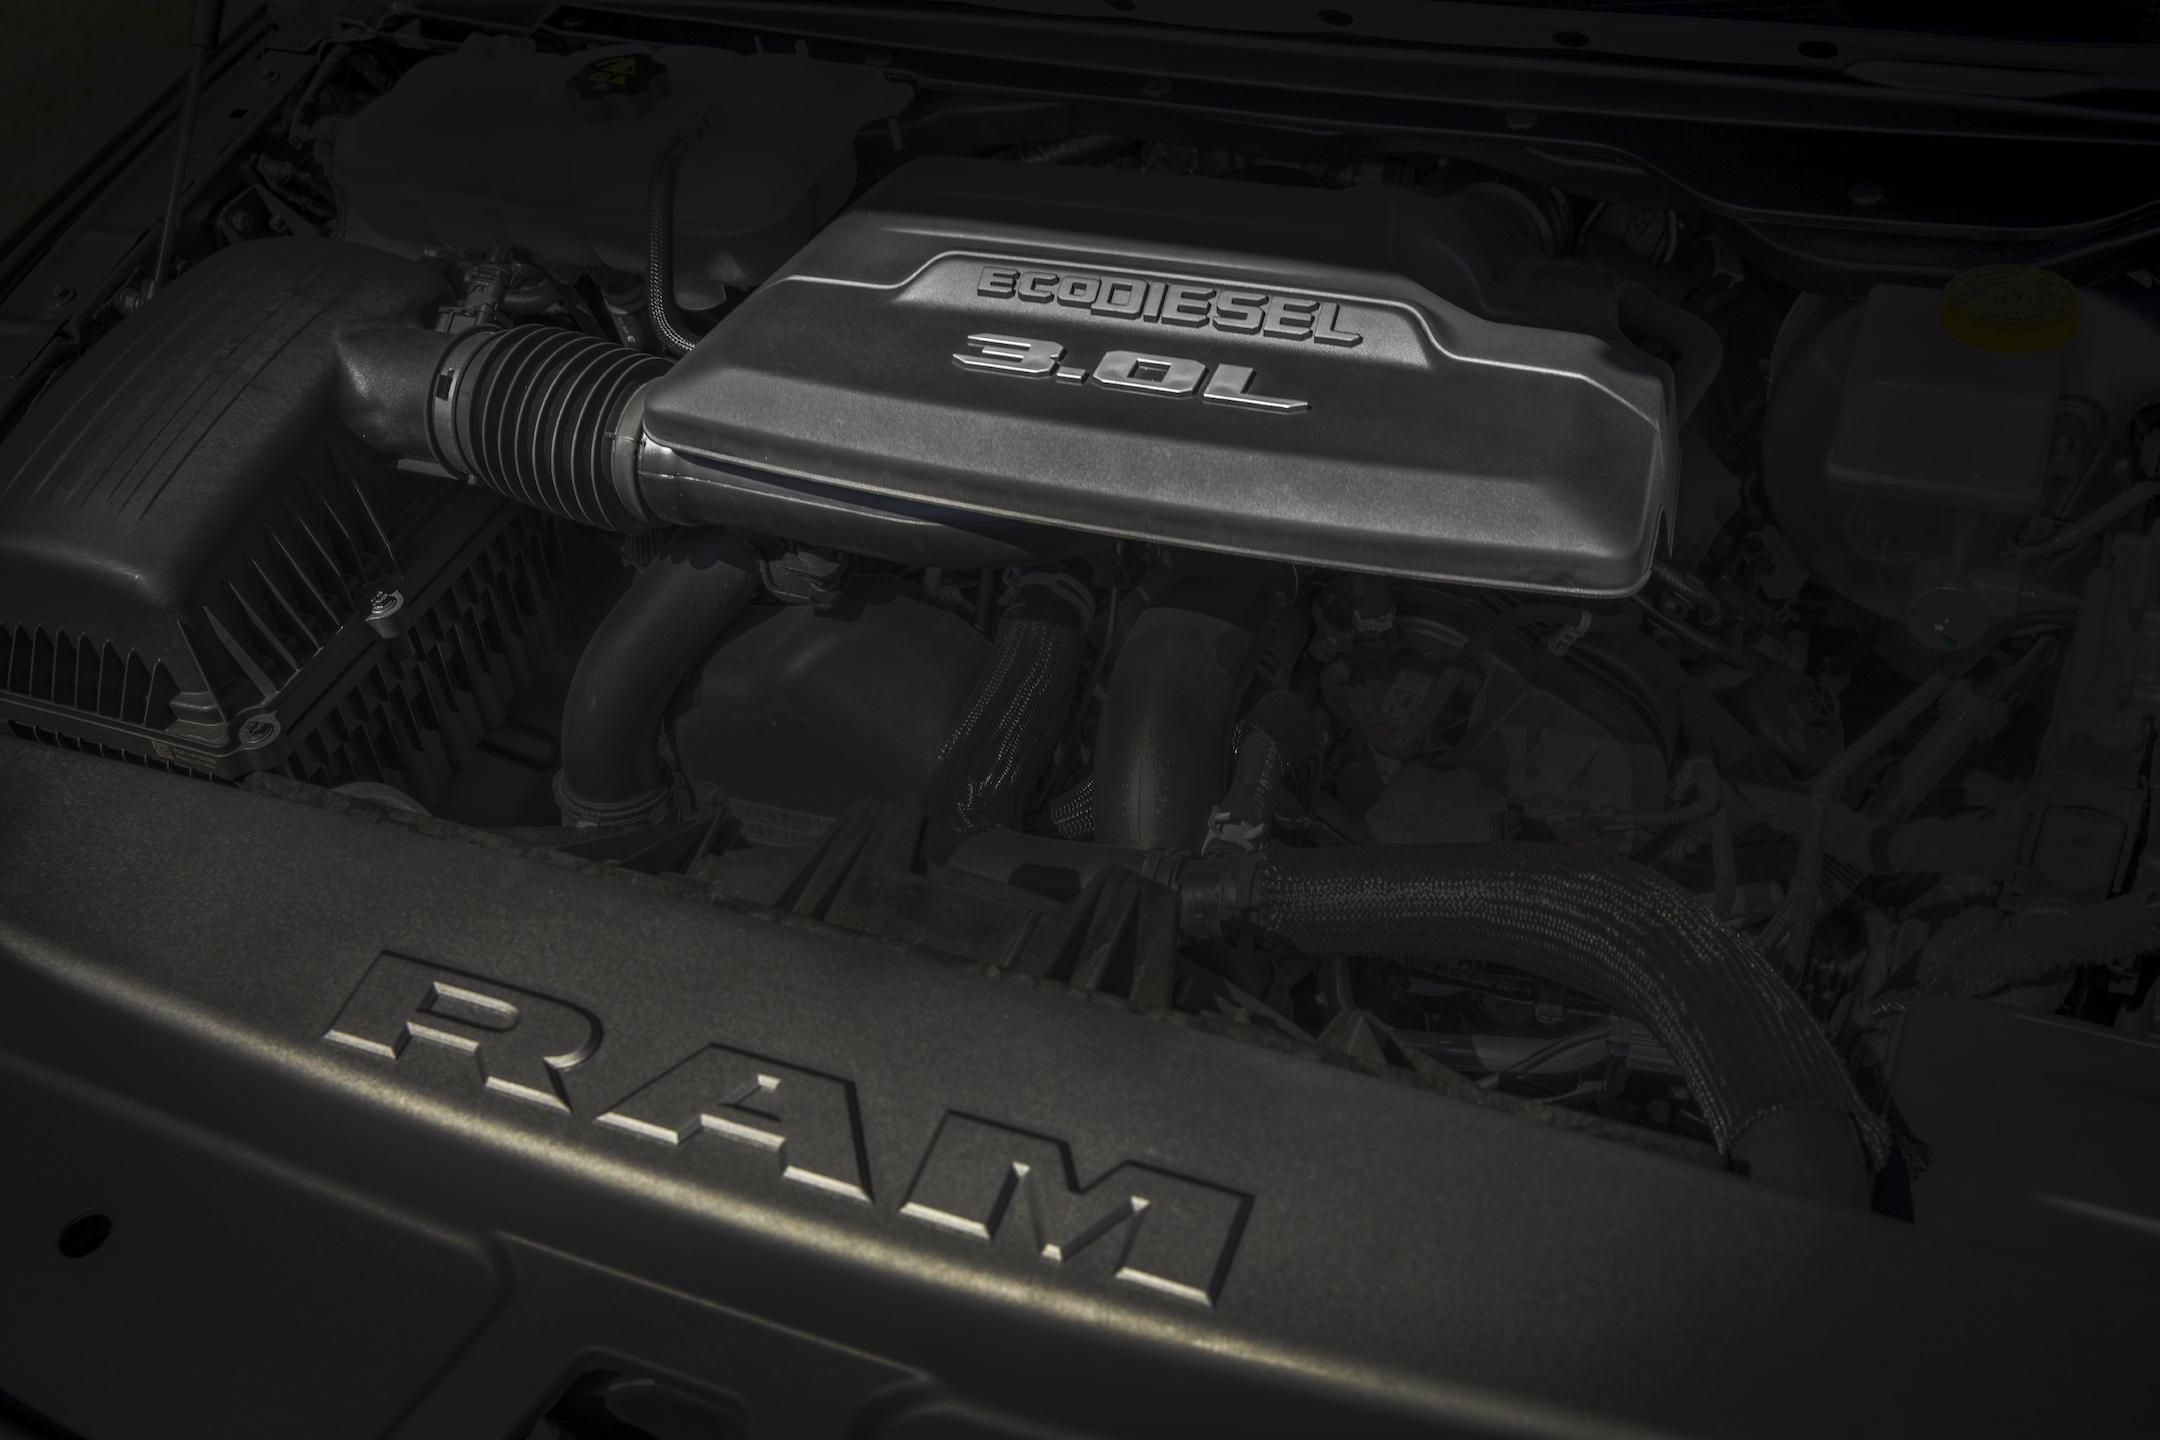 2020 Ram 1500 3.0-liter V-6 EcoDiesel engine